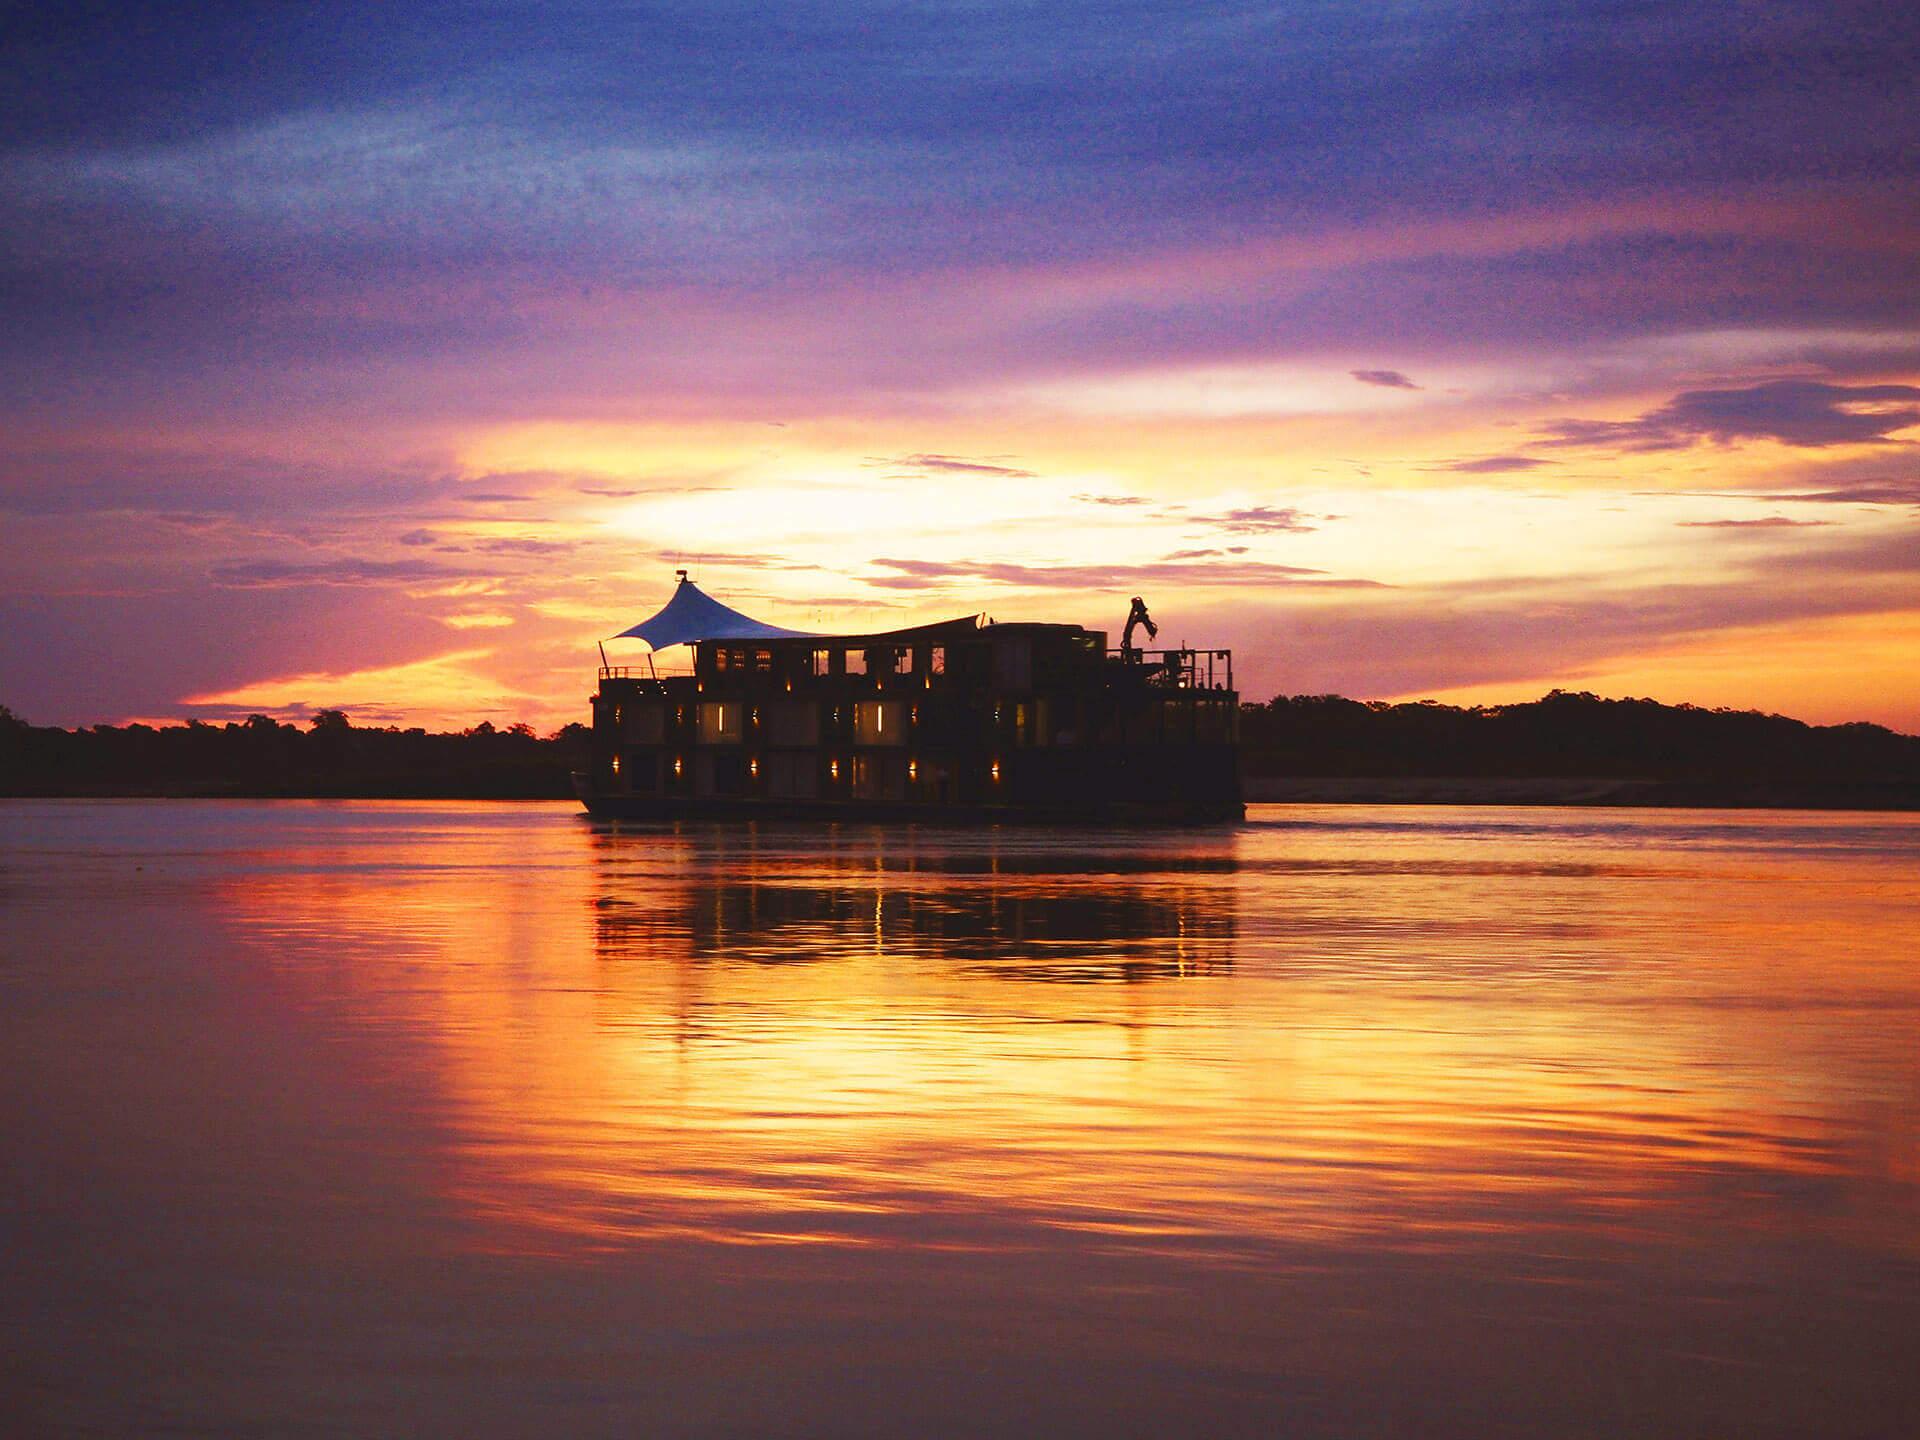 Destination: Down to the Amazon River